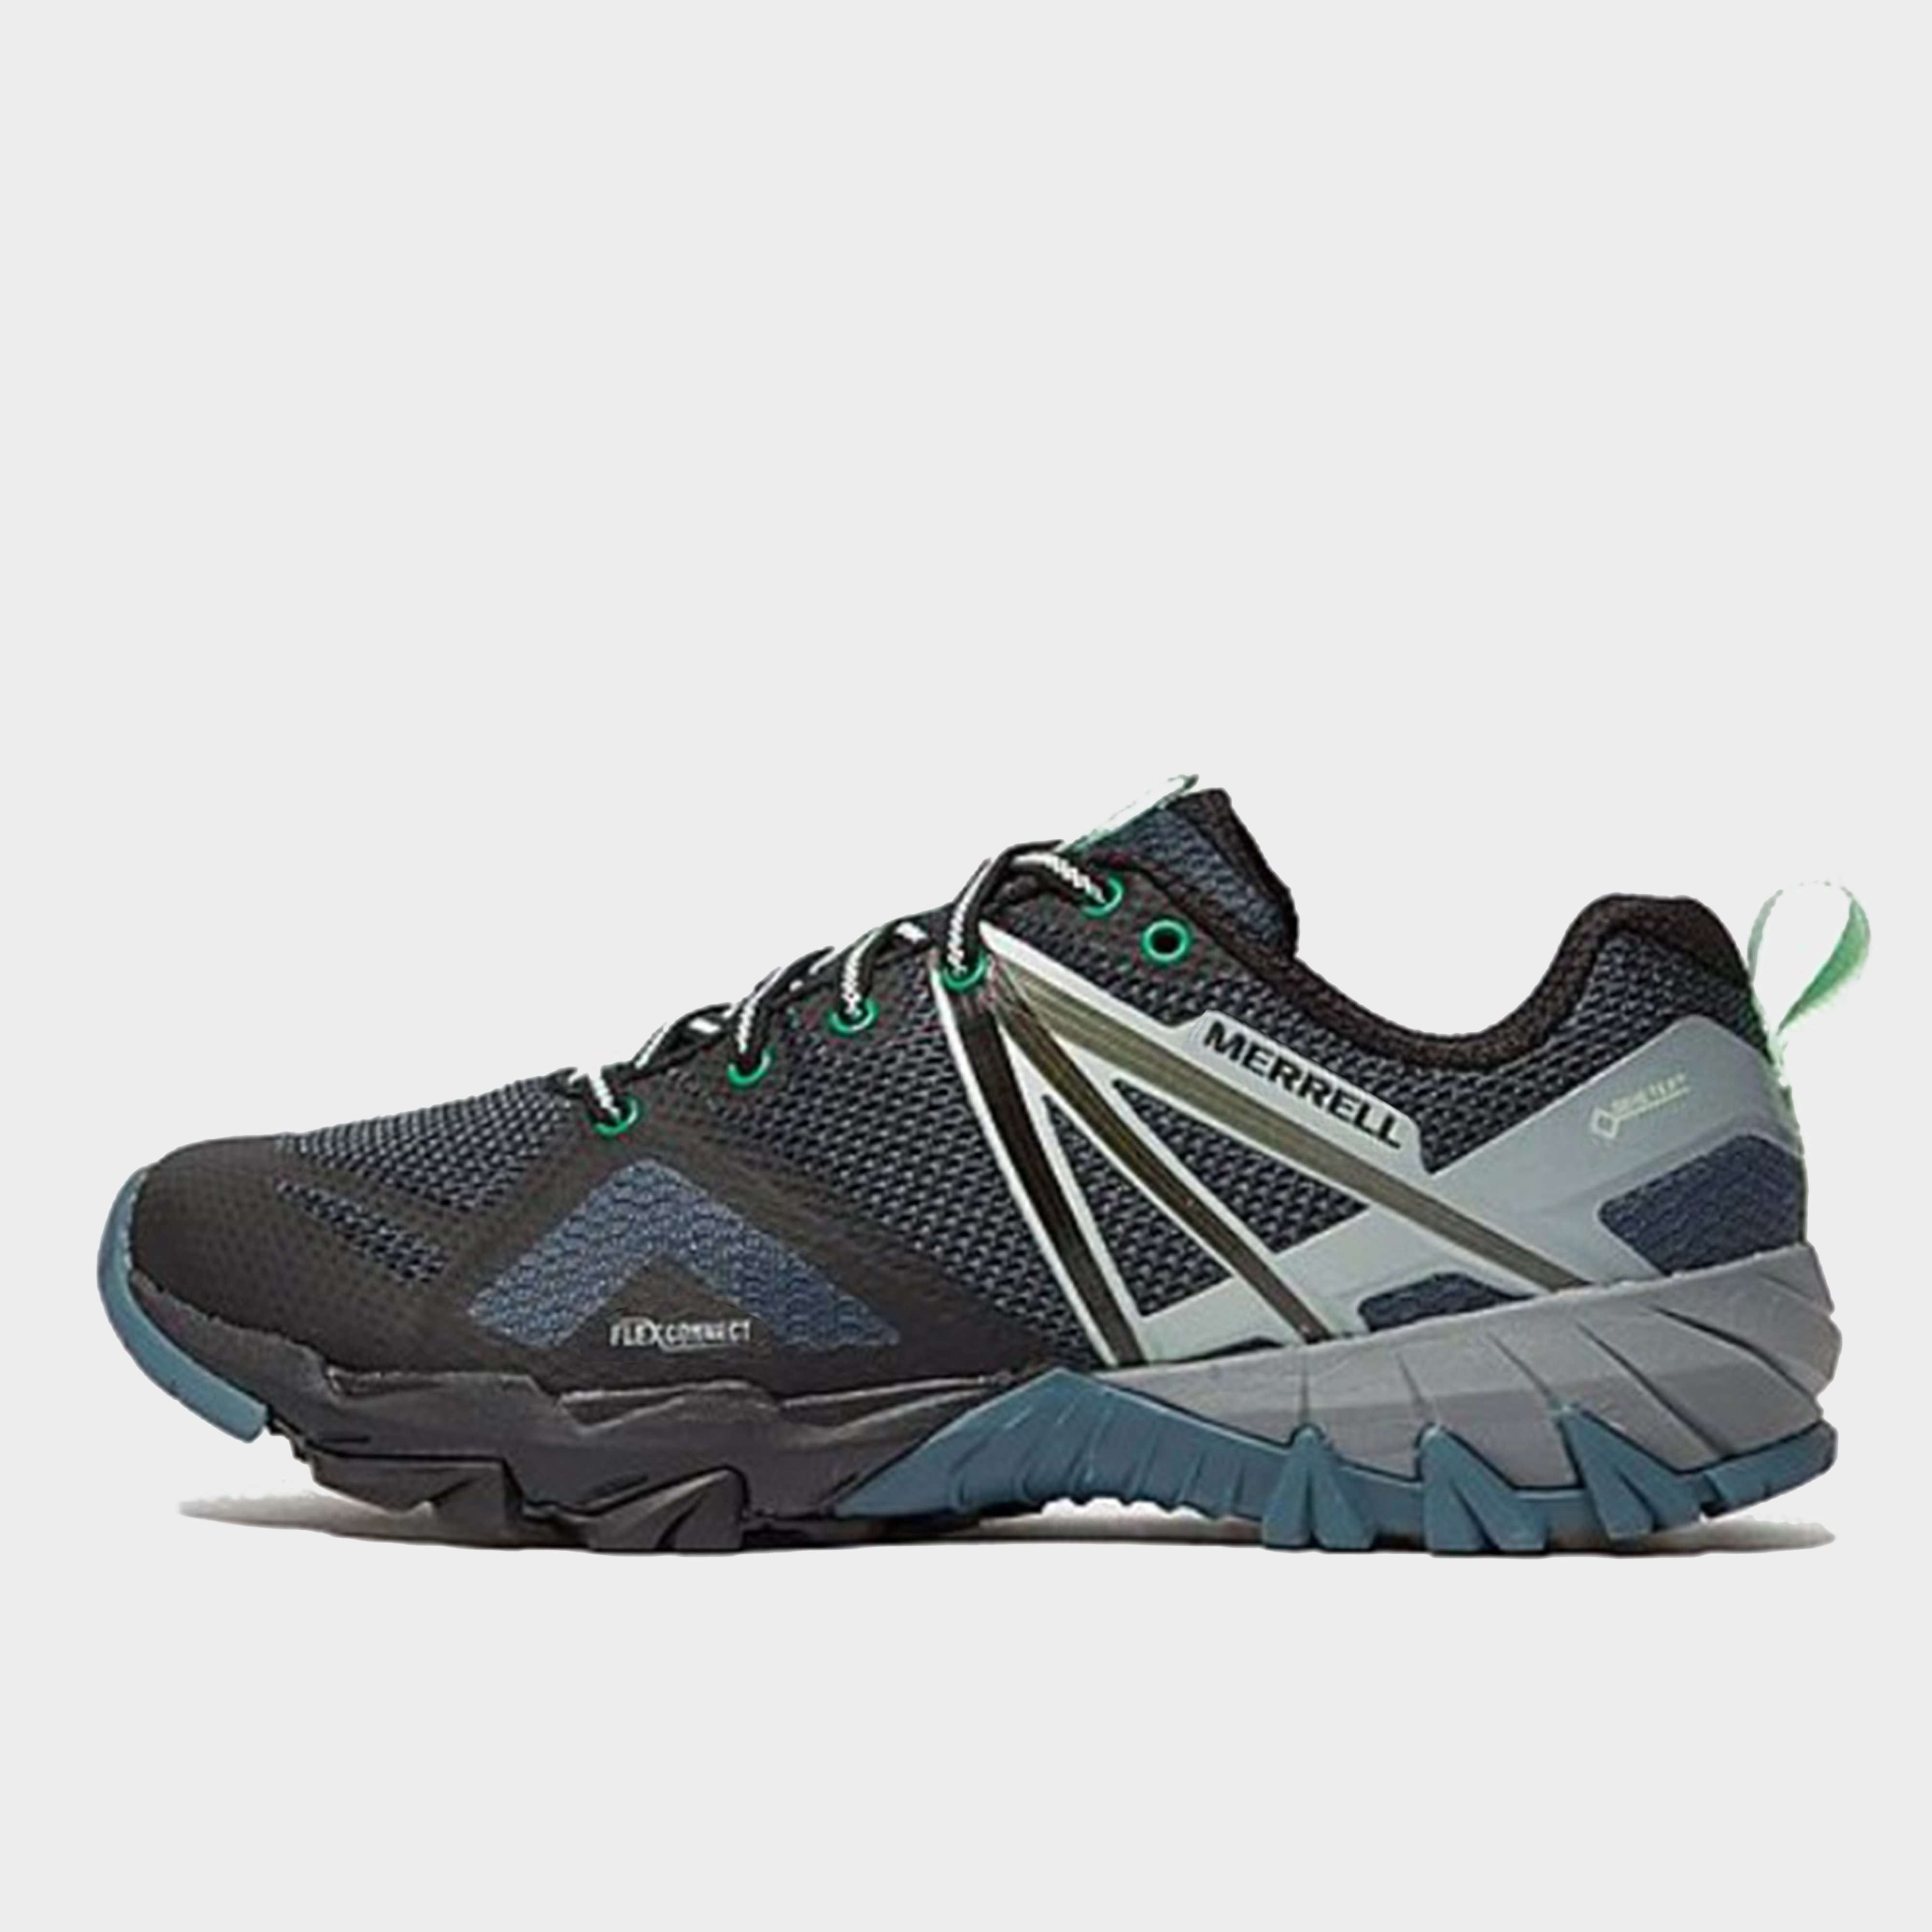 MERRELL Women's MQM Flex GORE-TEX® Shoes